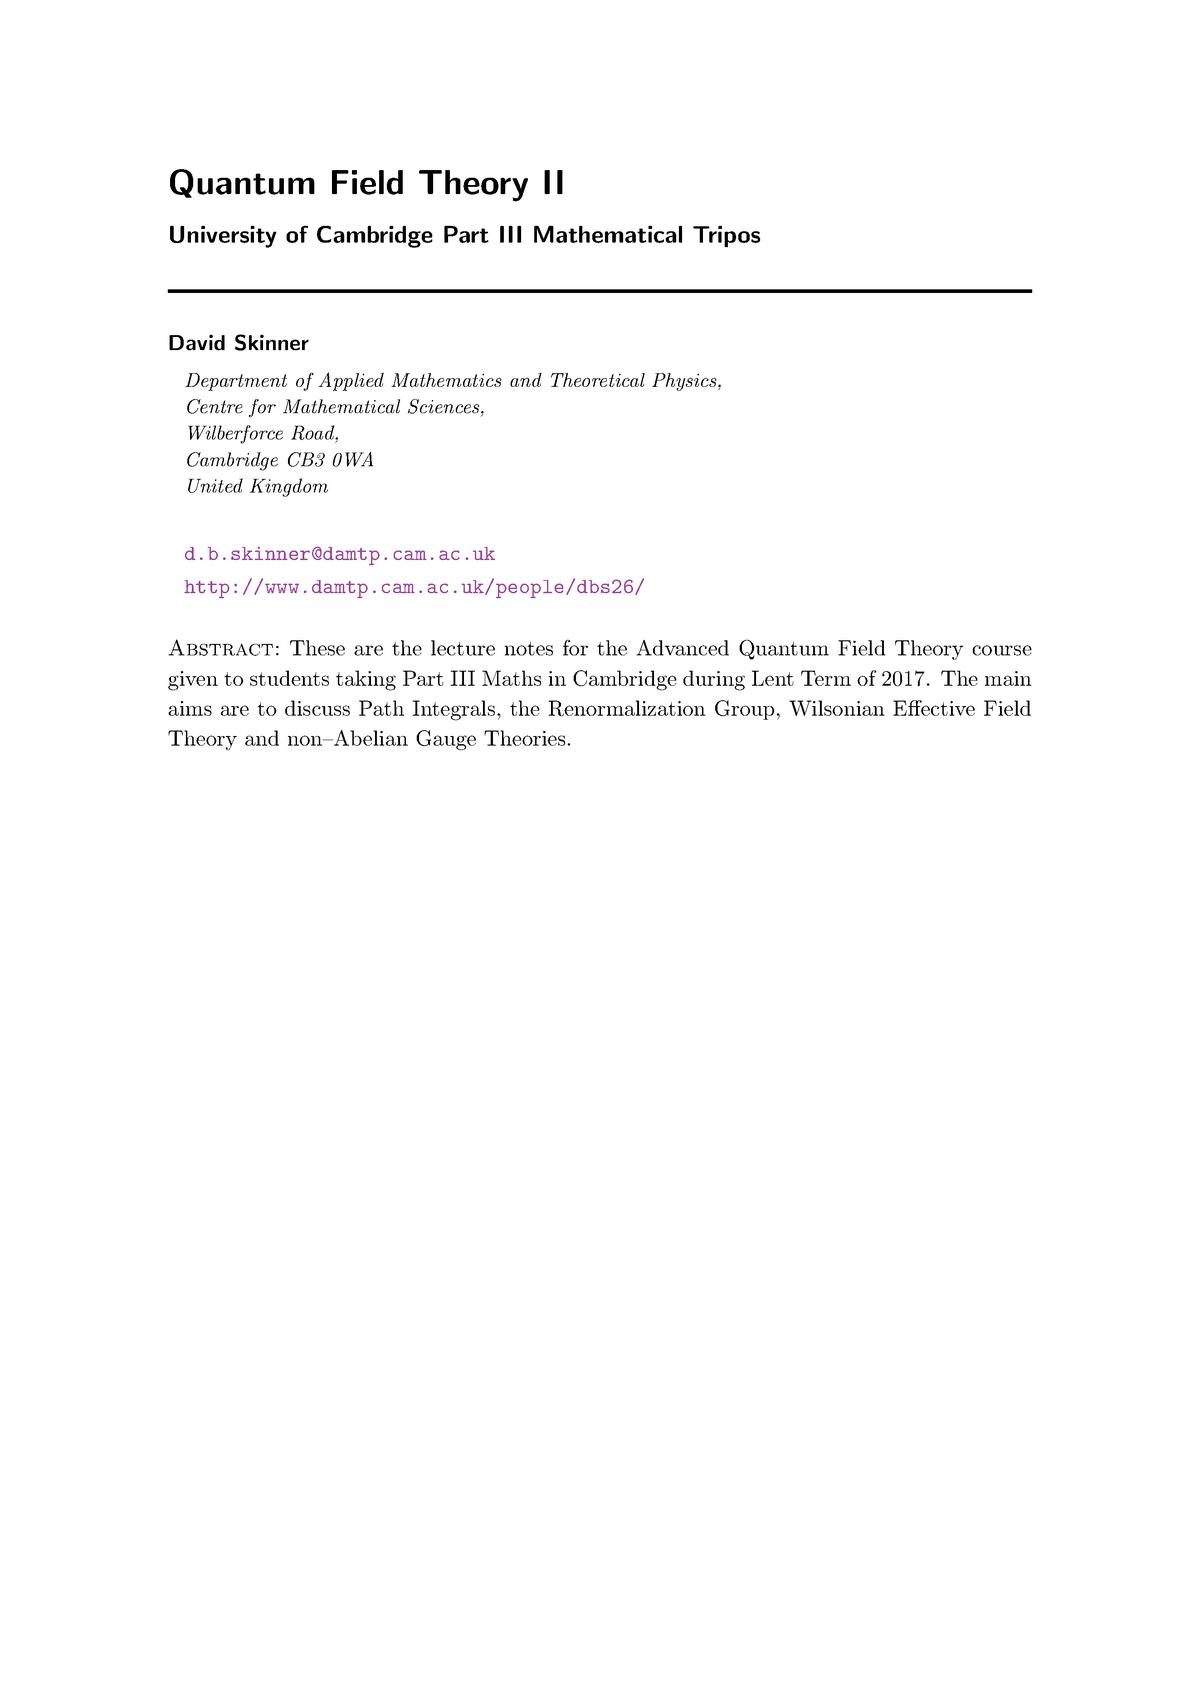 Quantum Field TheoryAn Introduction - Fundamentals of